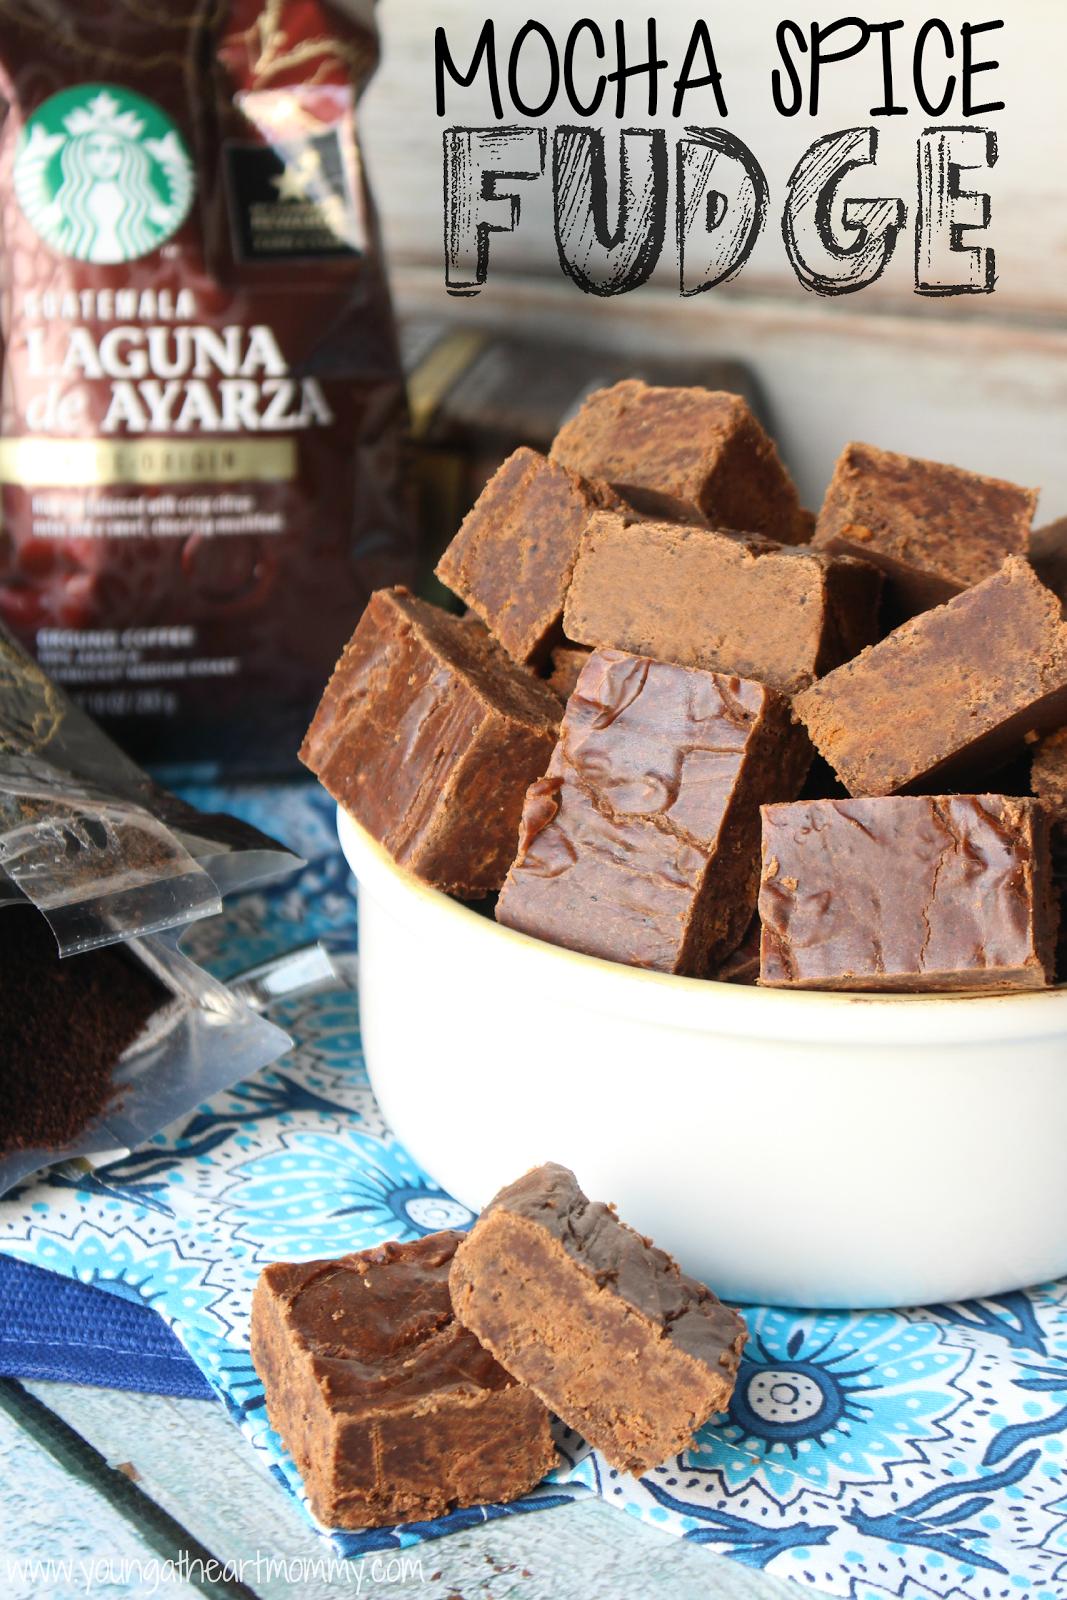 Mocha Spice Fudge recipe using Starbucks Single Origin Coffee Blends